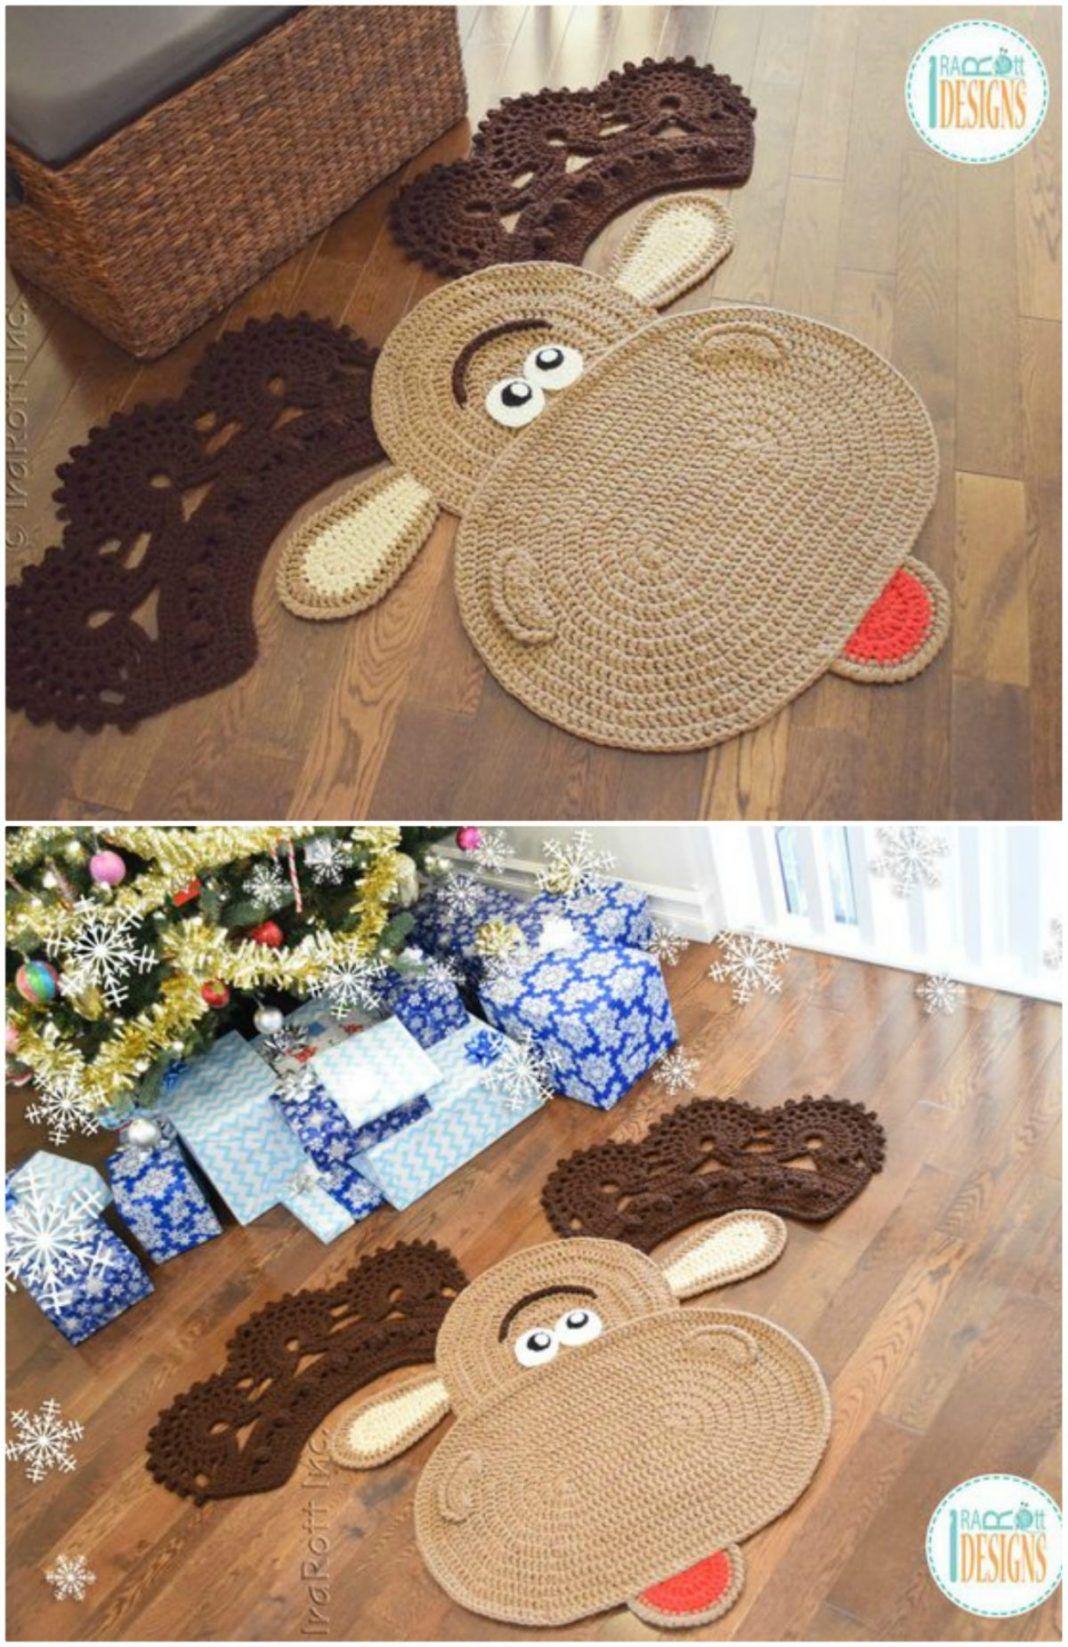 Crochet Animal Rugs By Irarott Etsy Best Ideas In 2020 Animal Rug Crochet Rug Crochet Pattern Shawl Wrap